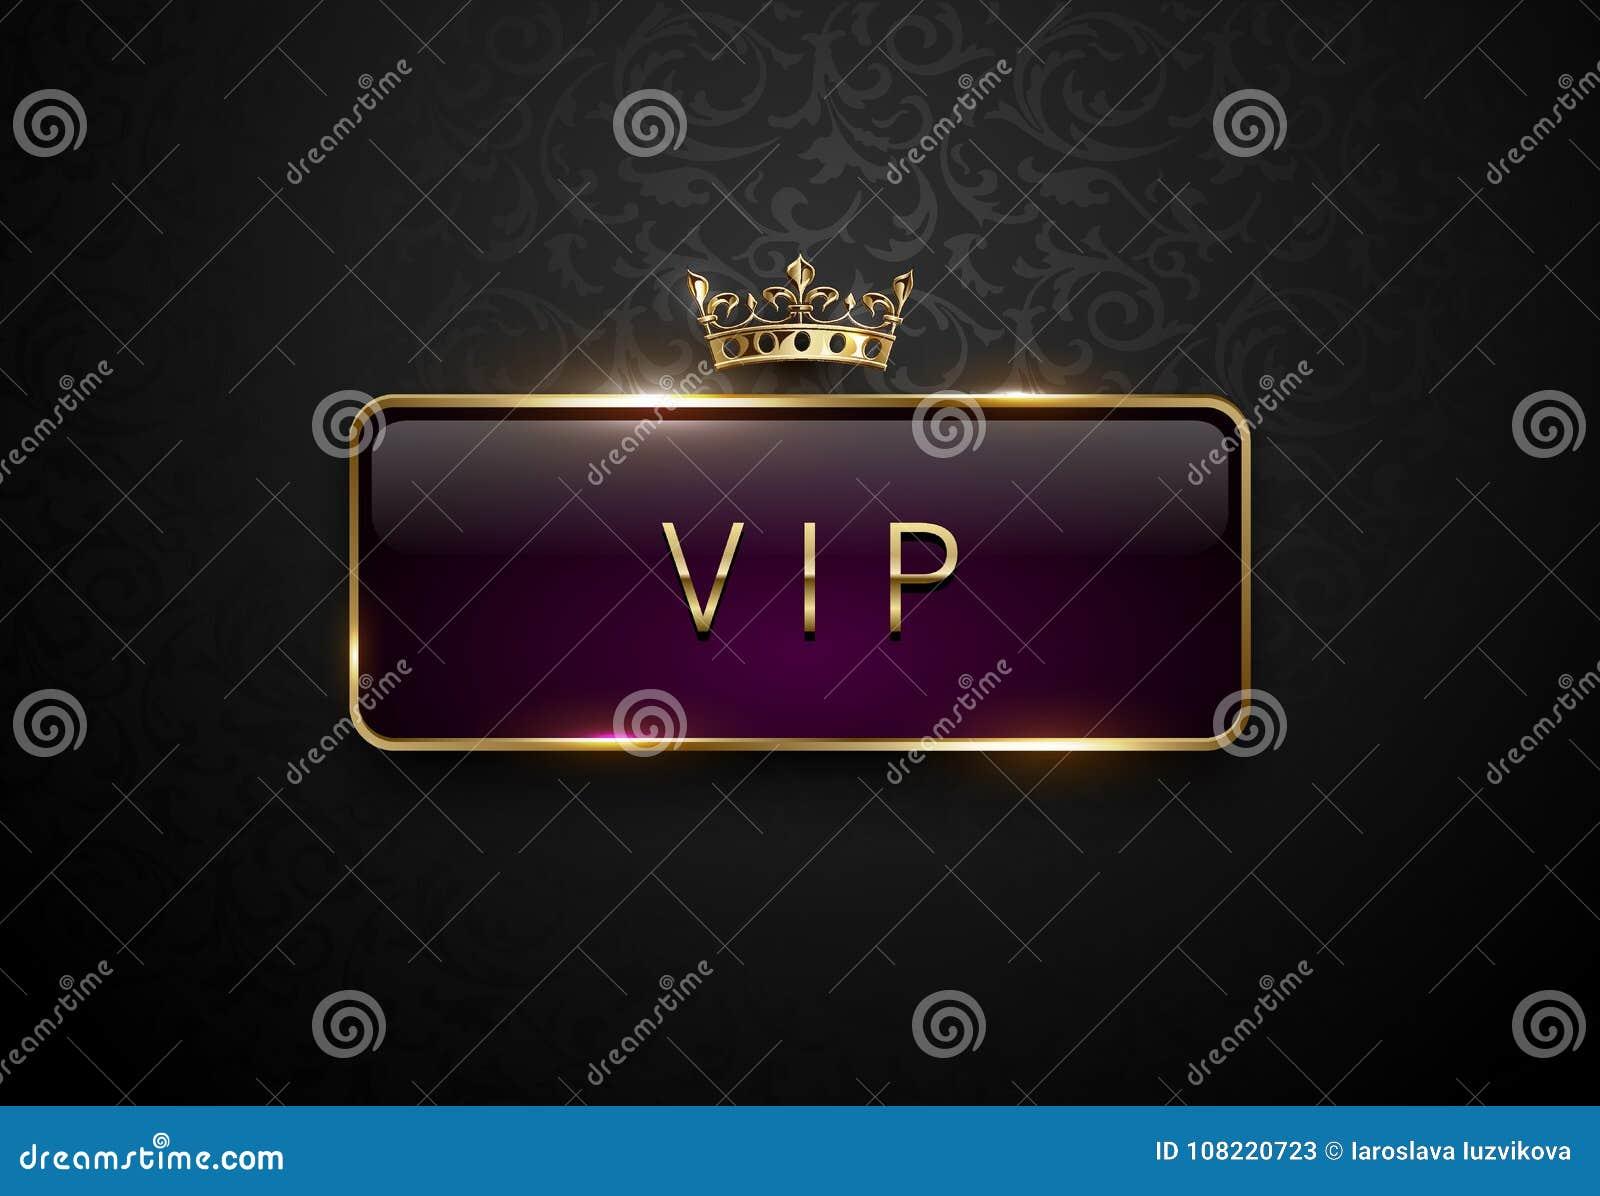 VIP βασιλική πορφυρή ετικέτα με το χρυσό πλαίσιο και κορώνα στο μαύρο floral υπόβαθρο σχεδίων Σκοτεινό πρότυπο ασφαλίστρου επίσης